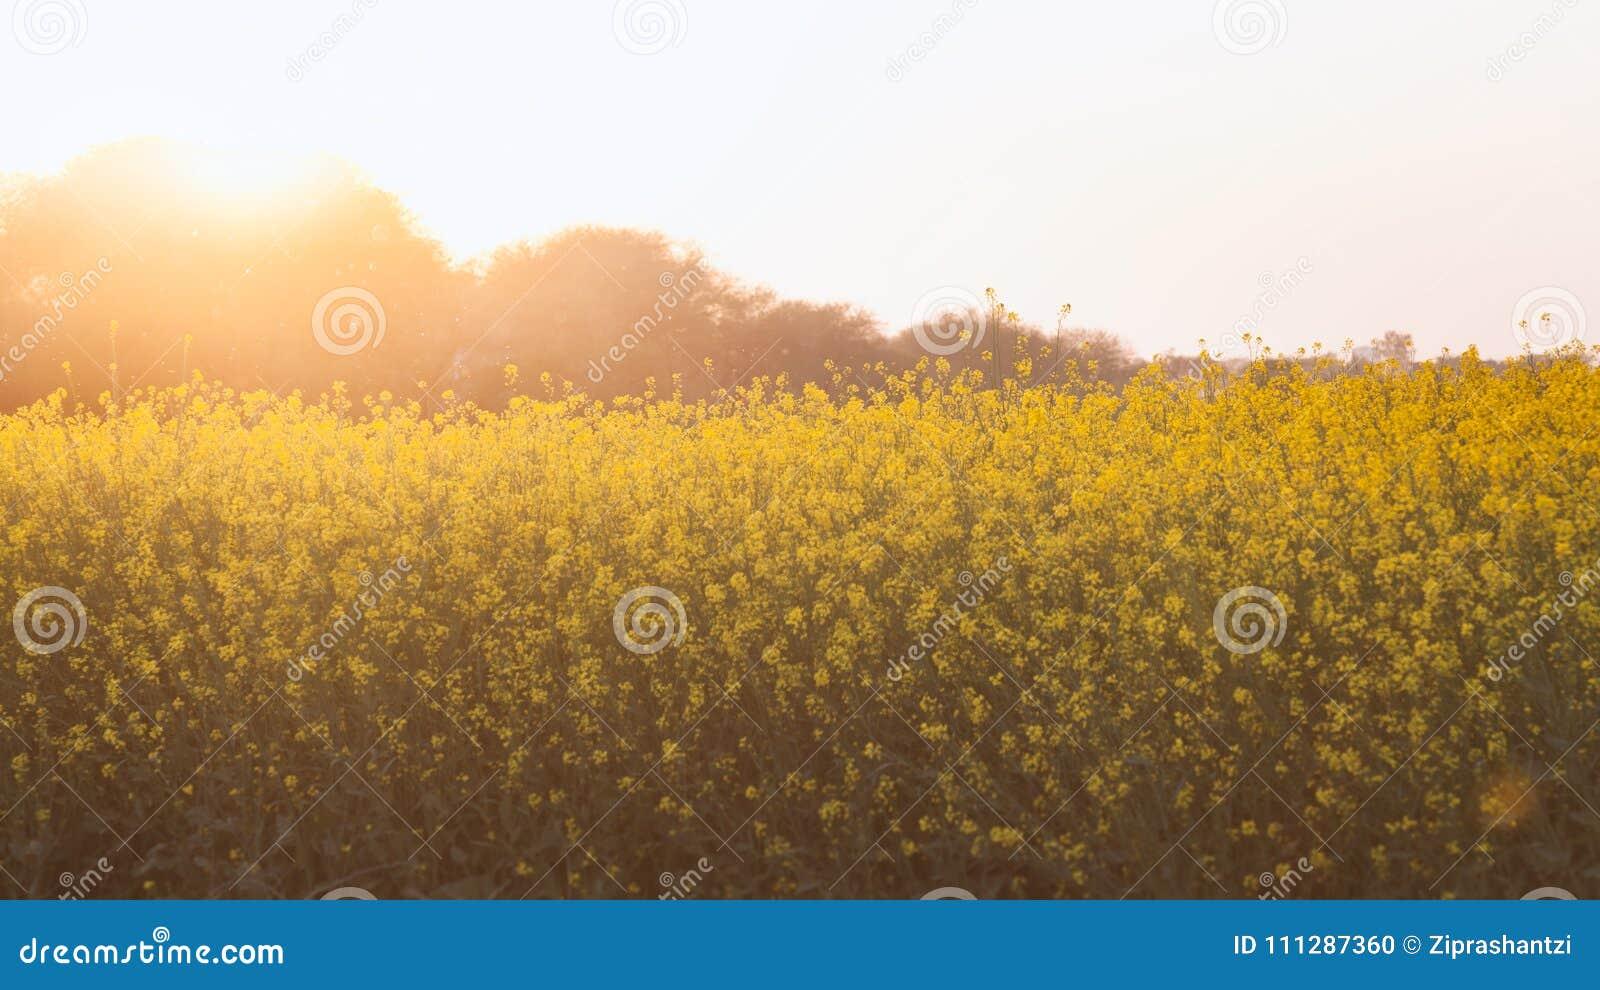 Beautiful Organic Yellow Mustard Flowers In Field Stock Photo